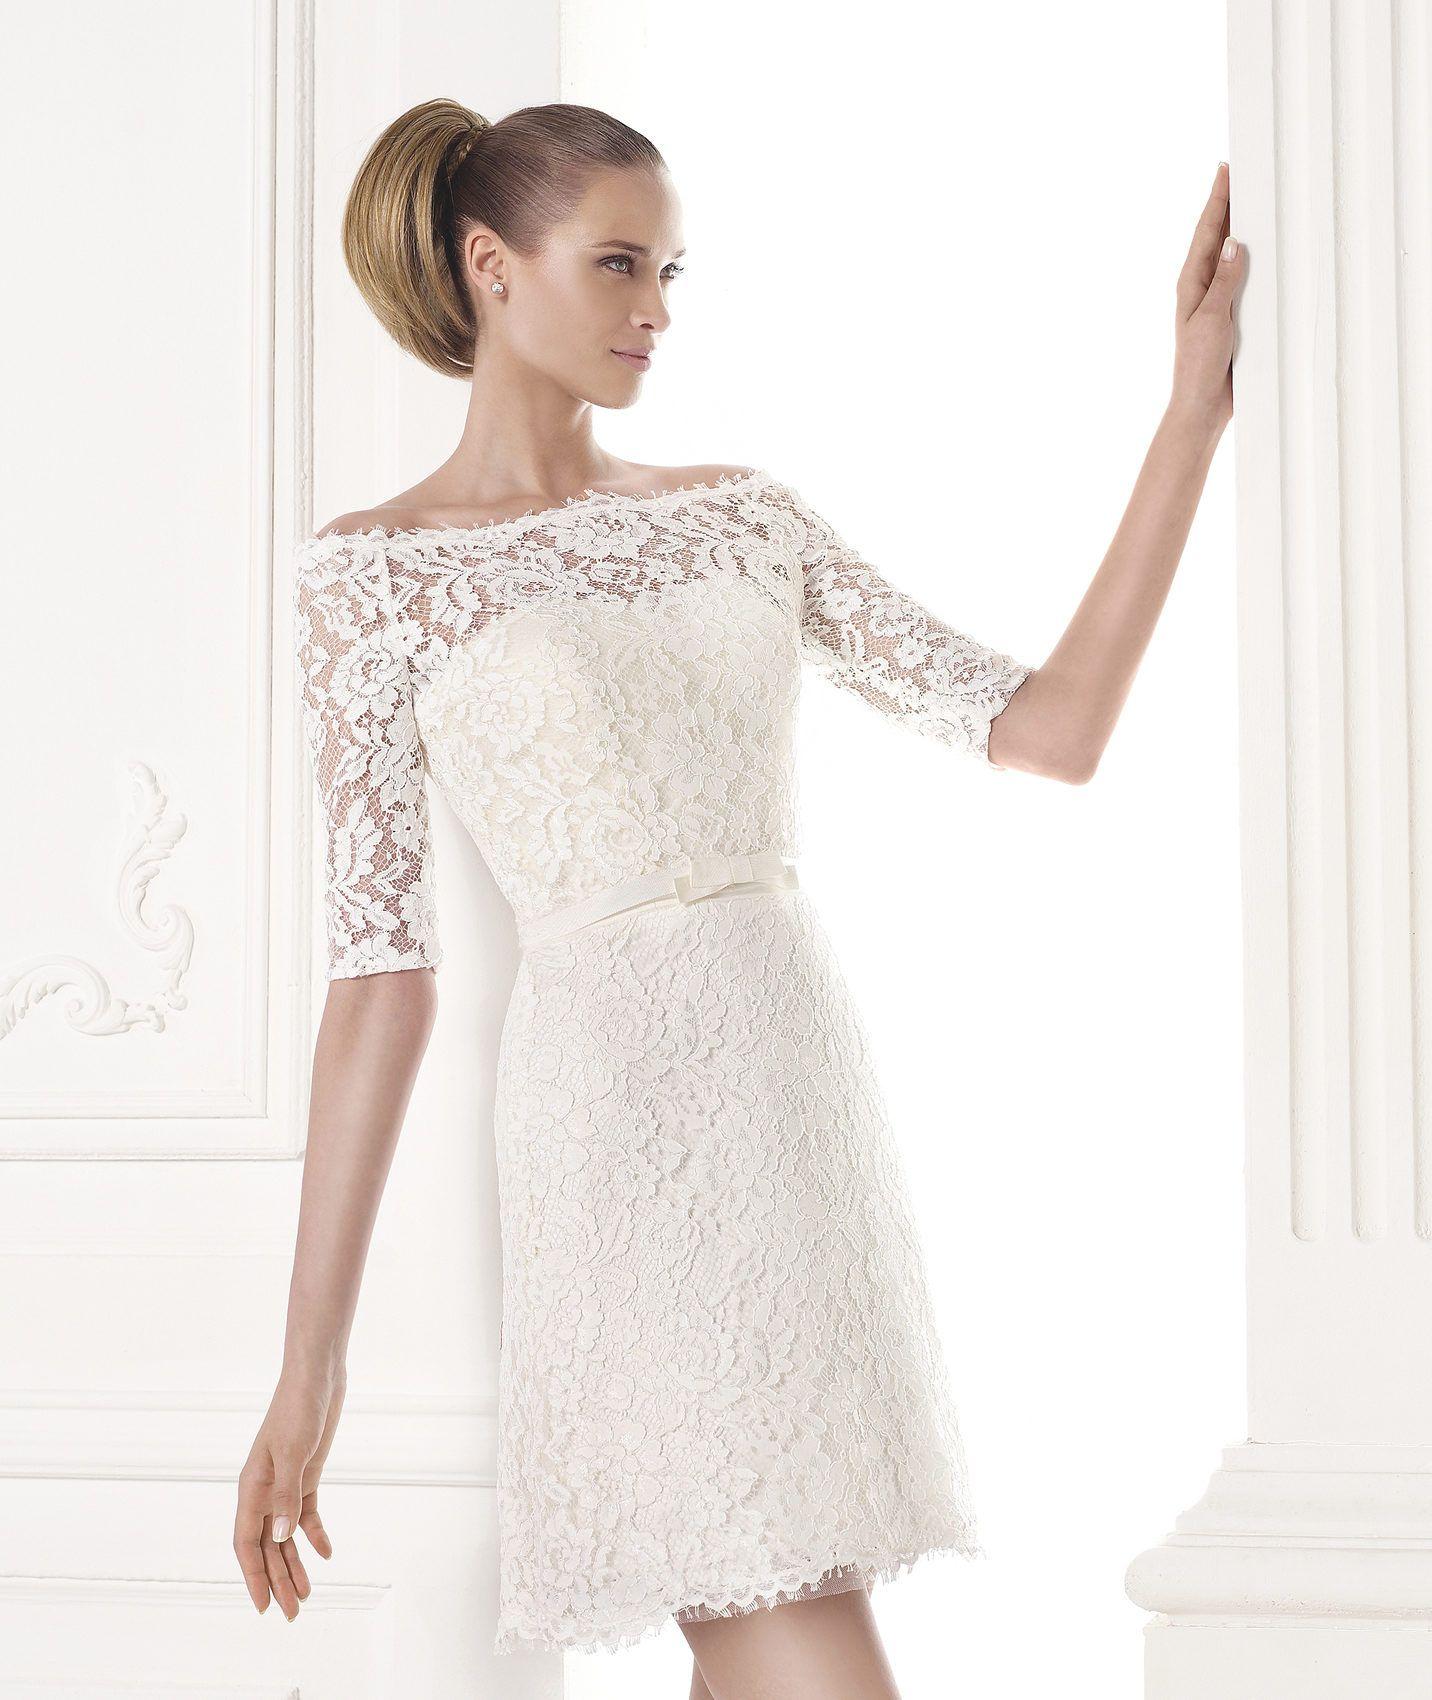 Vestidos de novia para una boda civil | momy | Pinterest | Dress ...